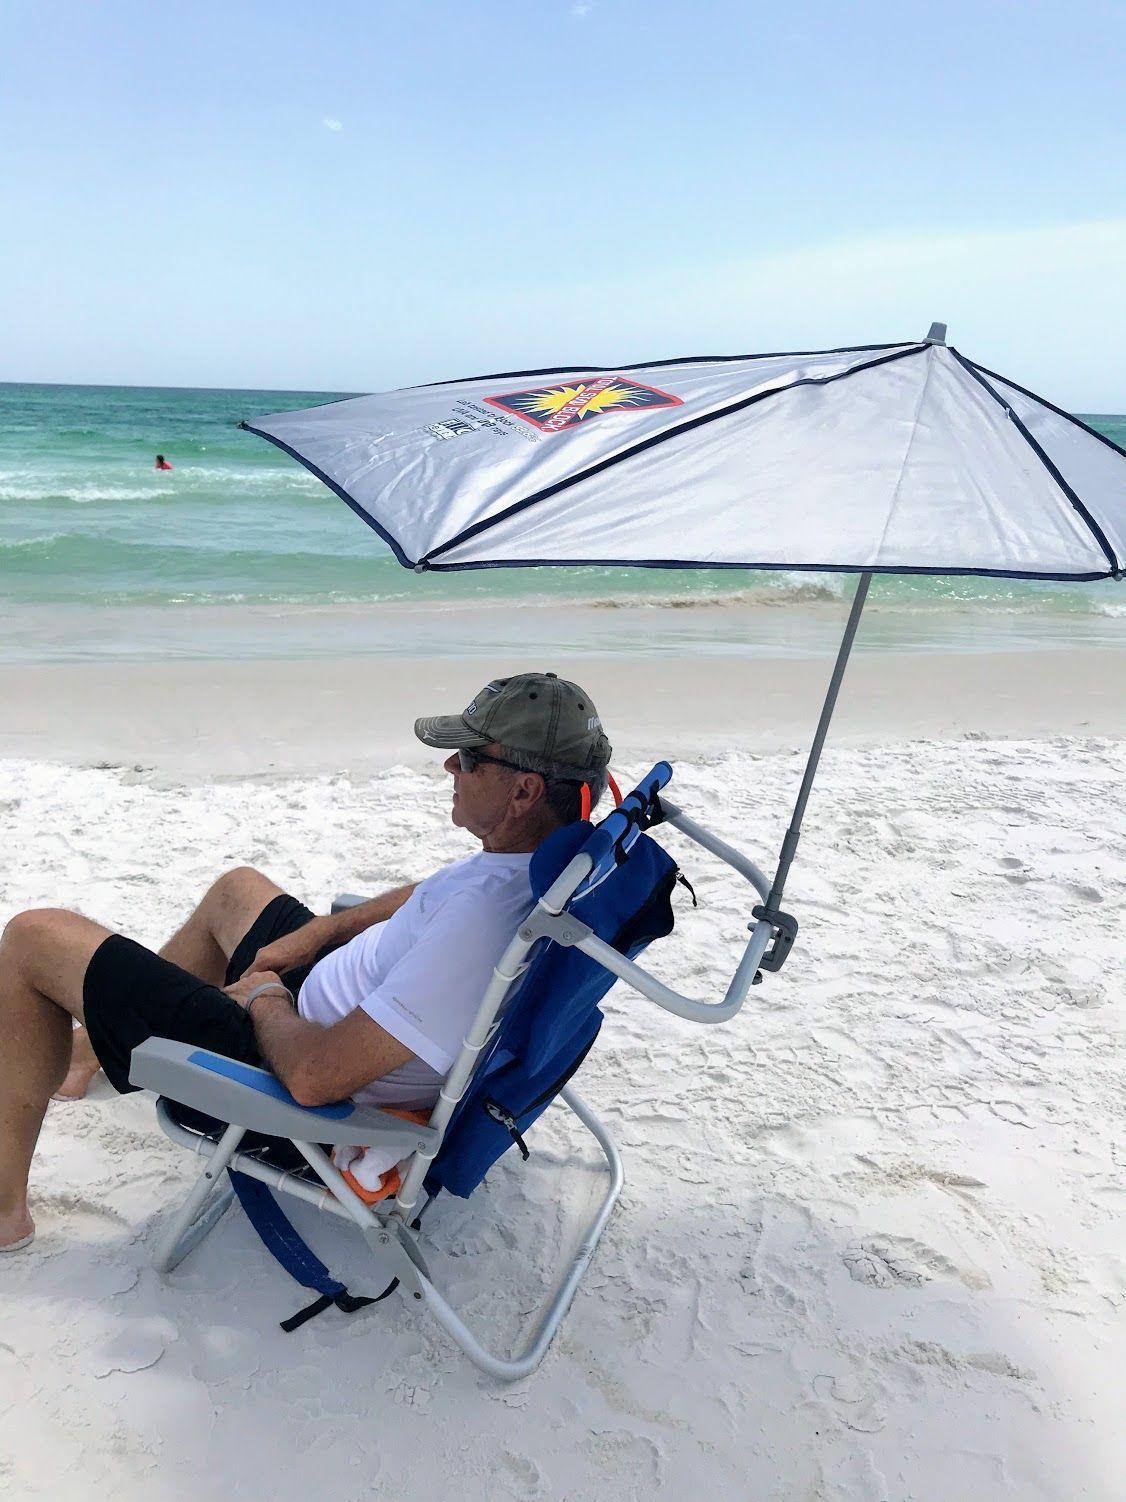 19 Enchanting Entrance Canopy Receptions Ideas Beach Canopy Beach Chair With Canopy Beach Chair Accessories